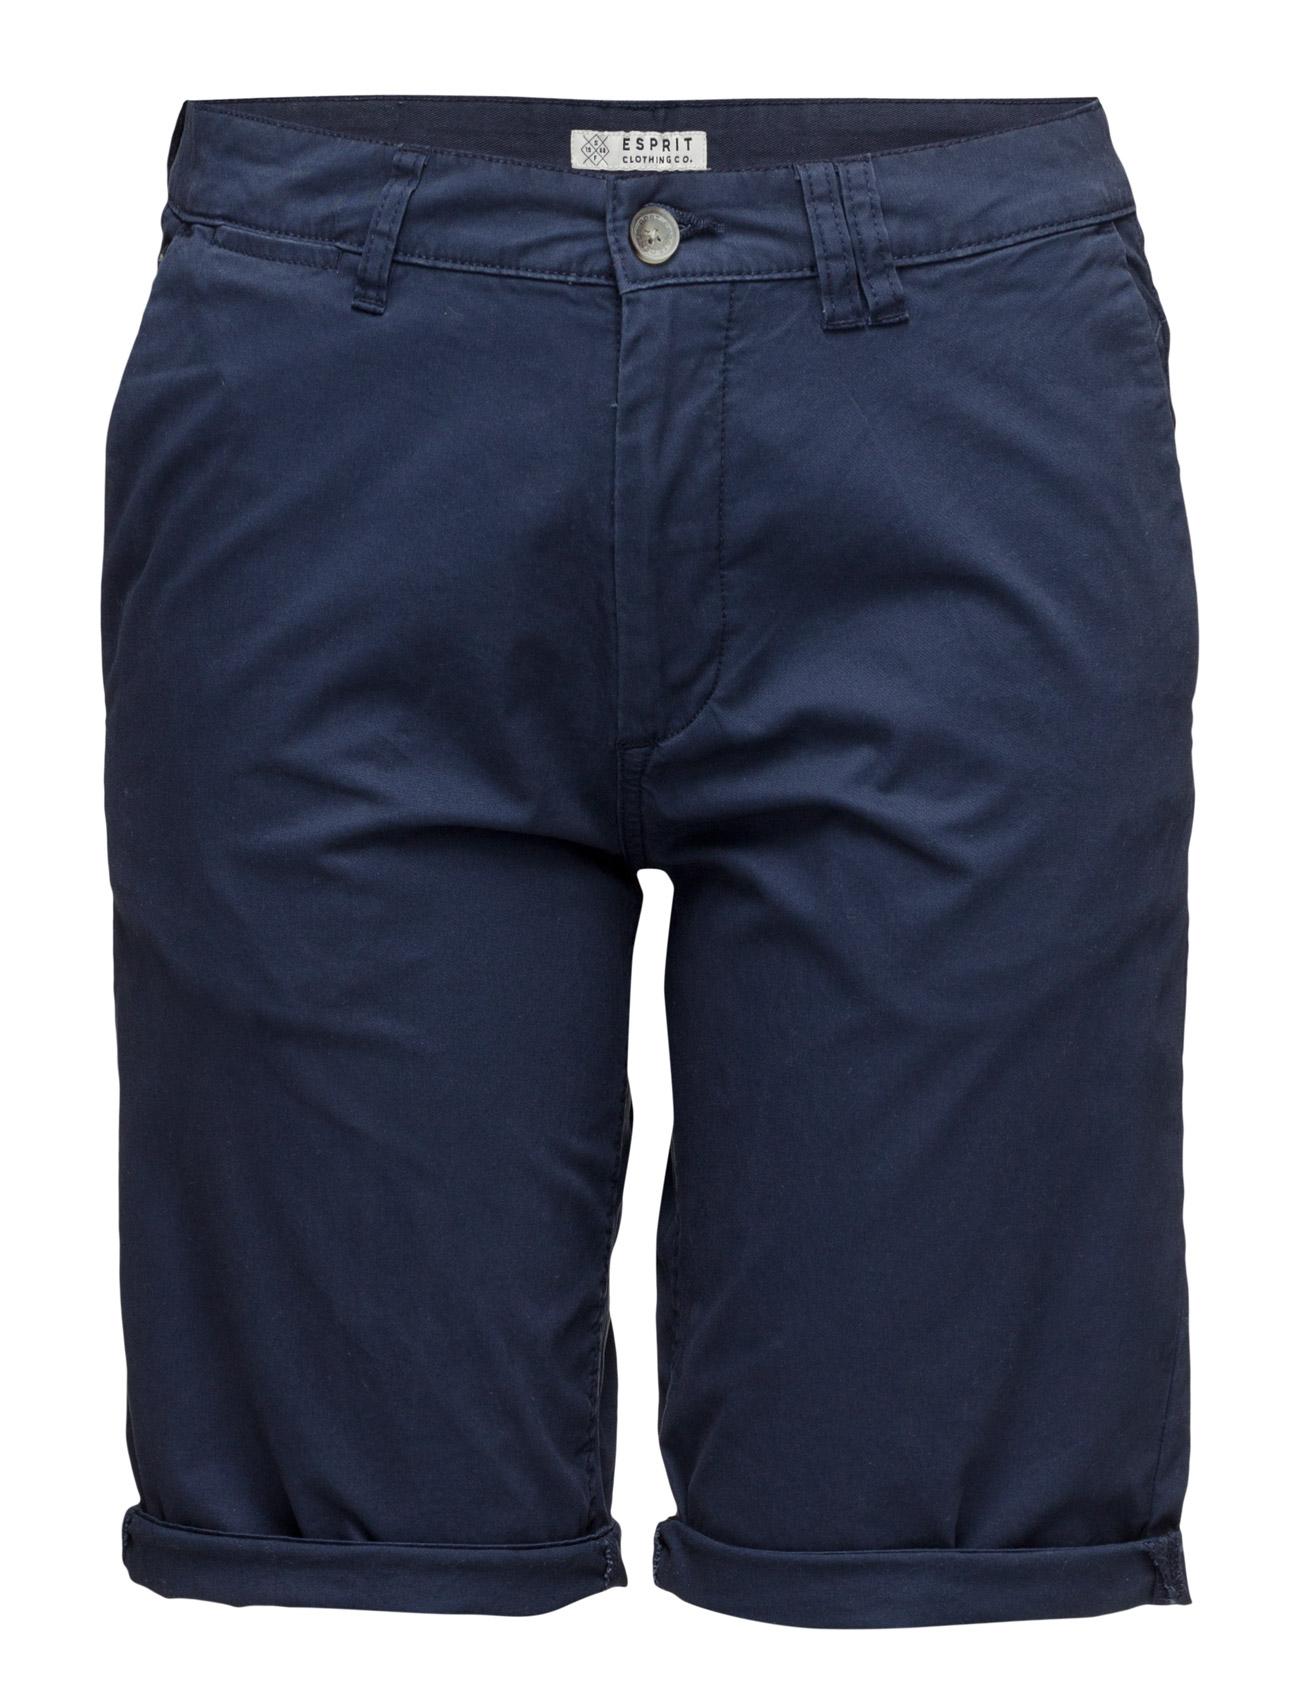 Shorts Woven Esprit Casual Bermuda shorts til Herrer i